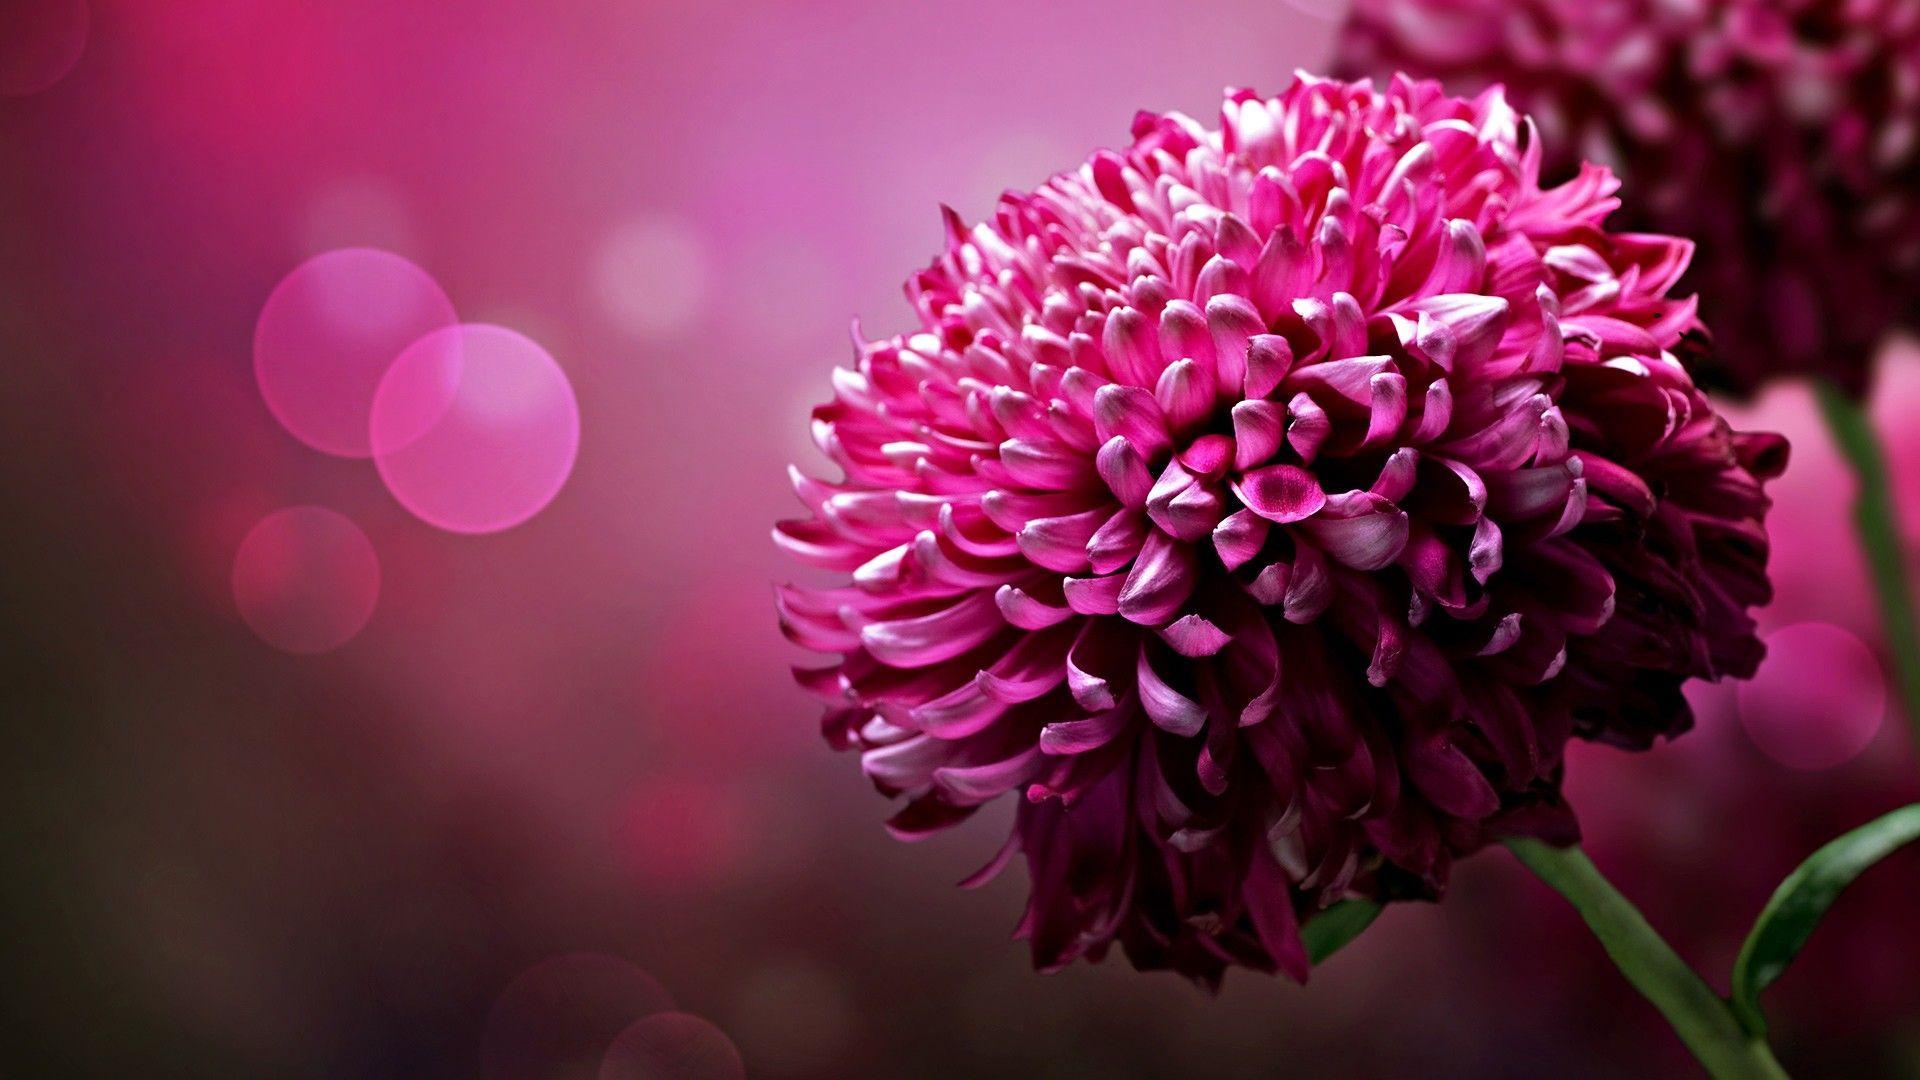 Pin On Login Flower wallpaper desktop background